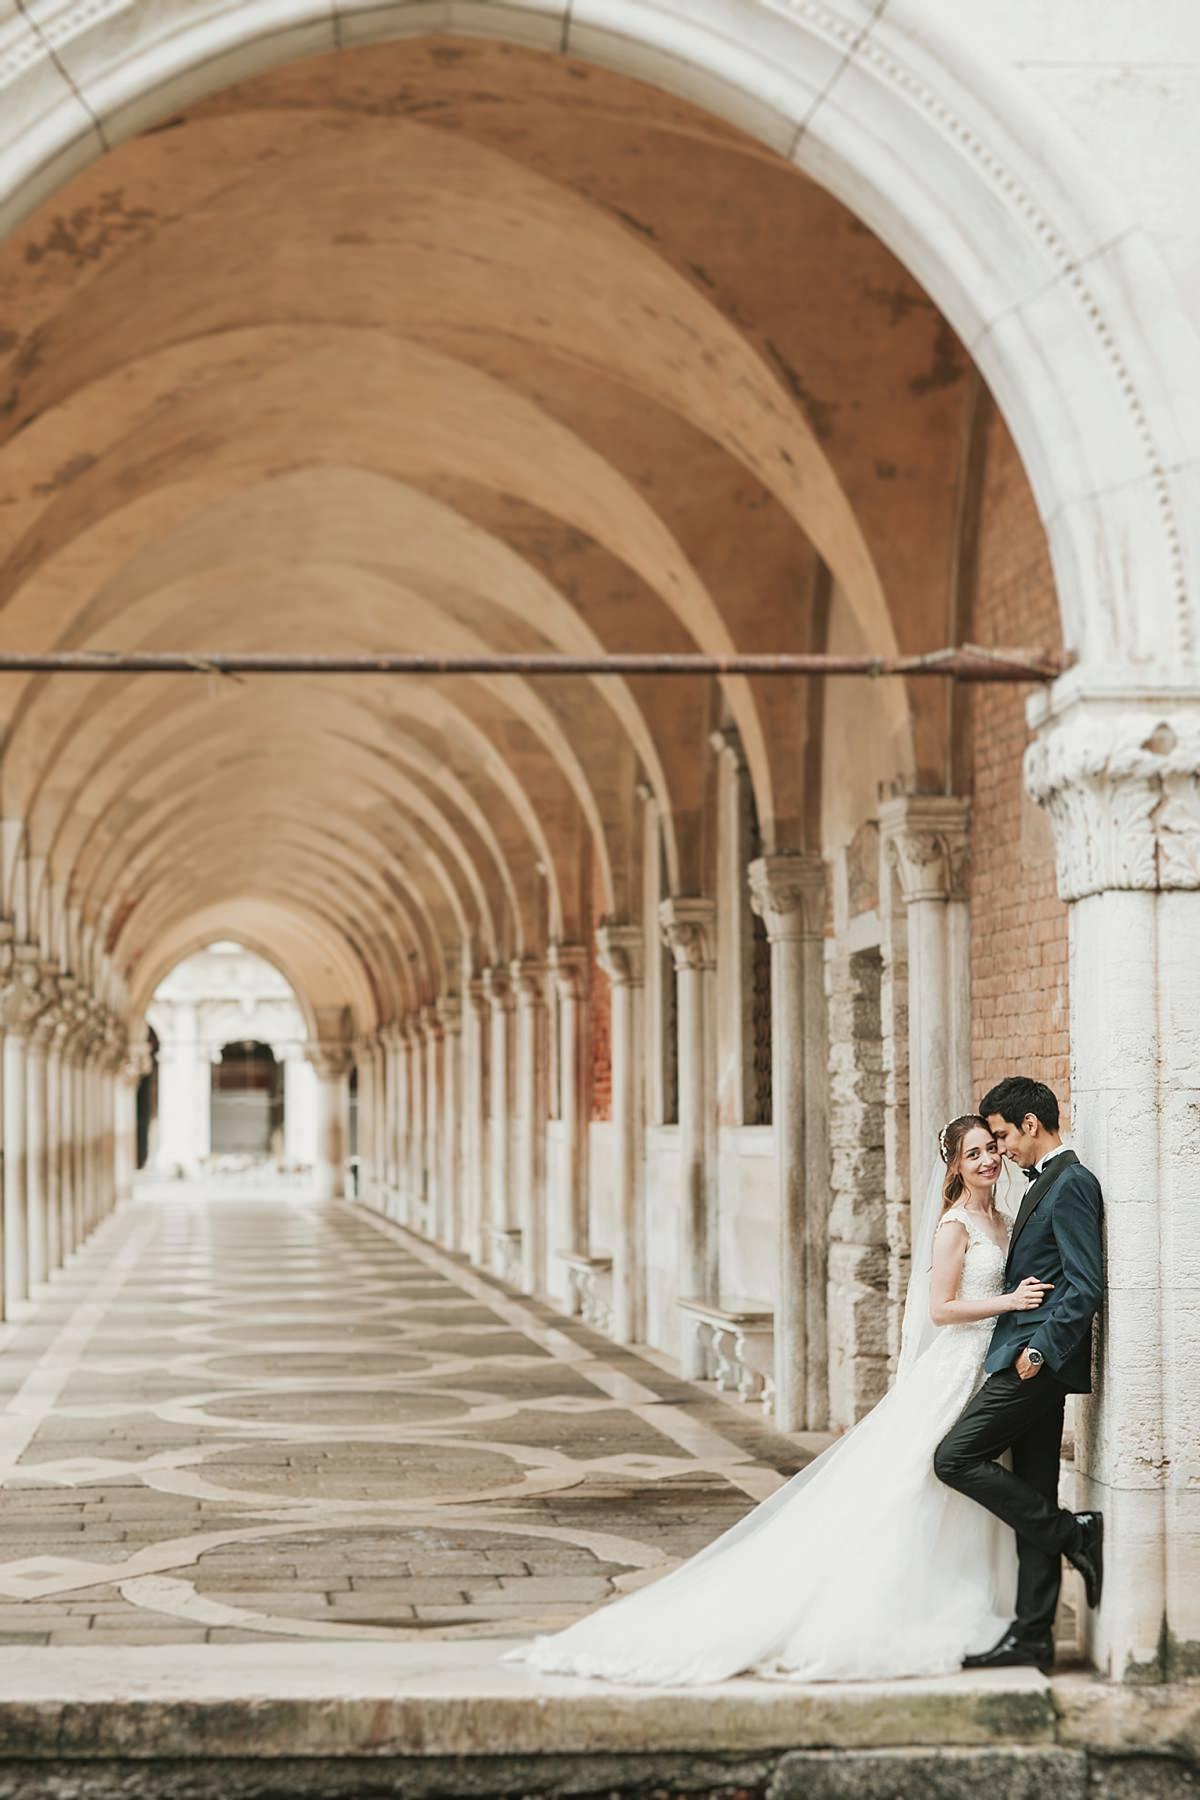 romantica-luna-di-miele-a-venezia_0022